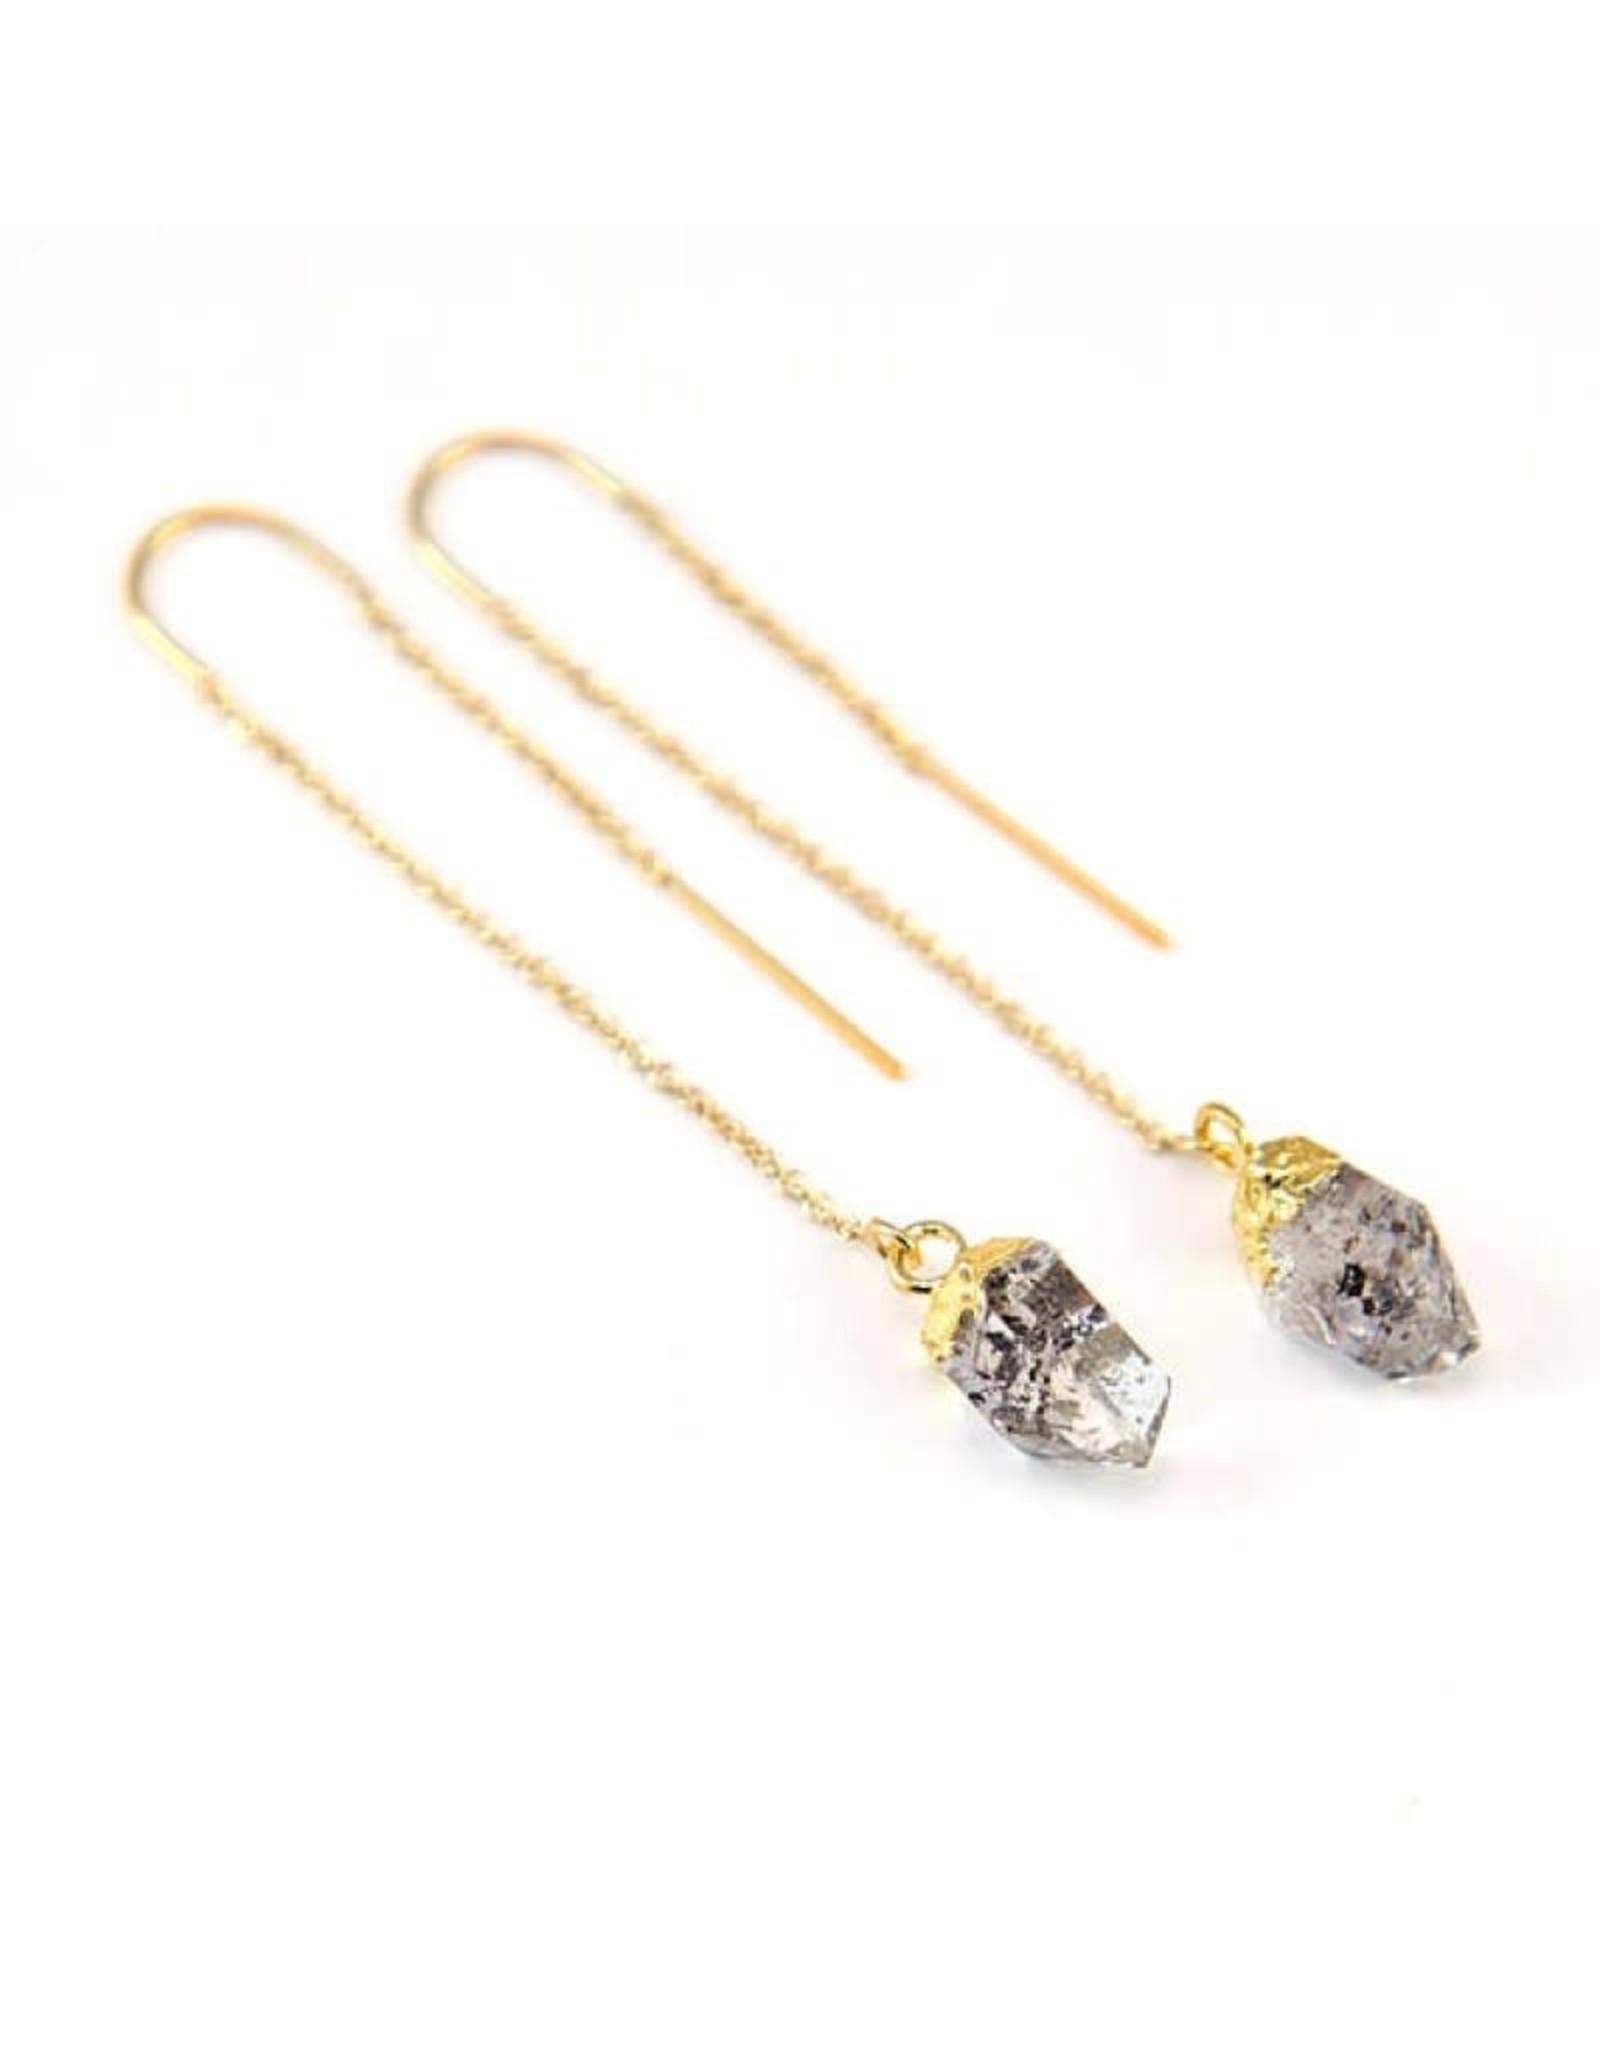 Thread Through Earrings - Herkimer Diamond/Gold